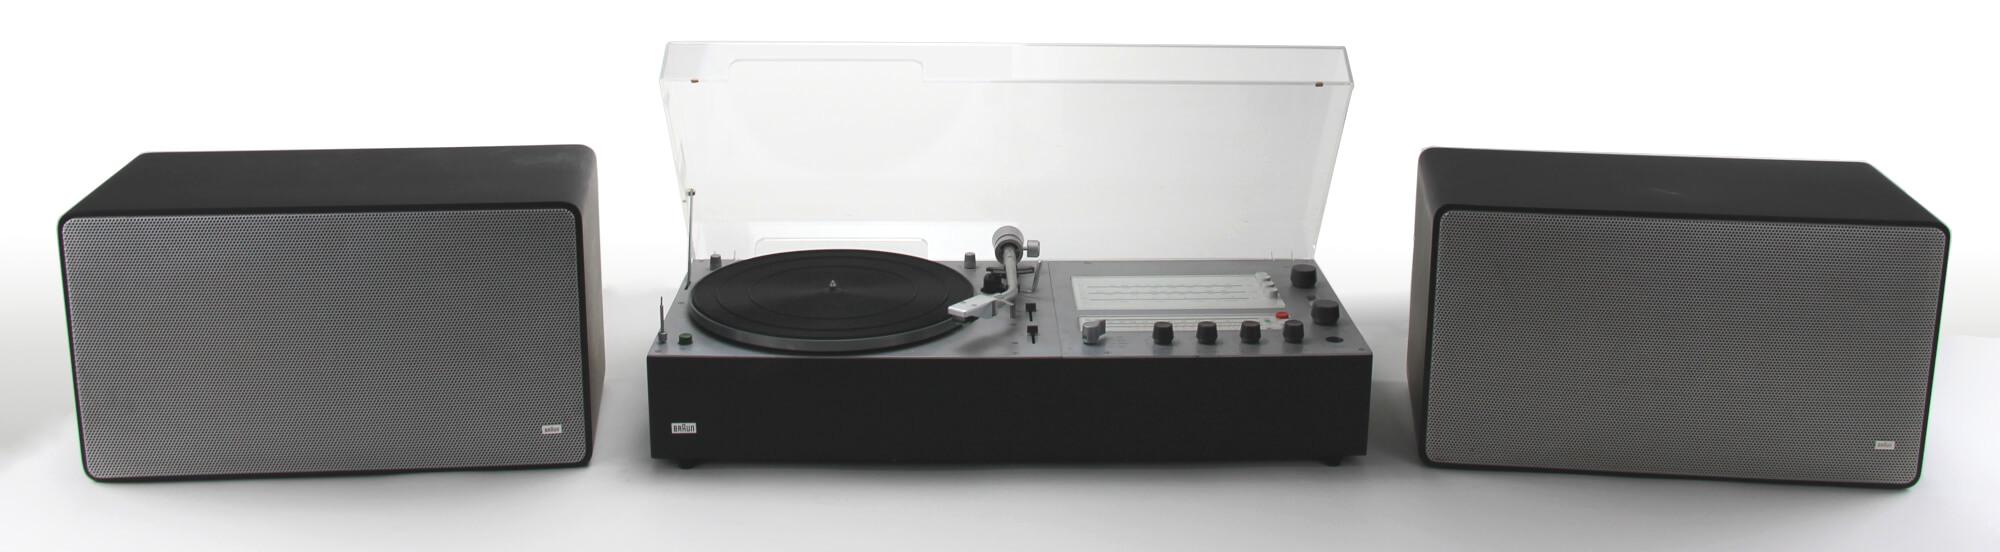 braun audio 310 anthrazit & L 625